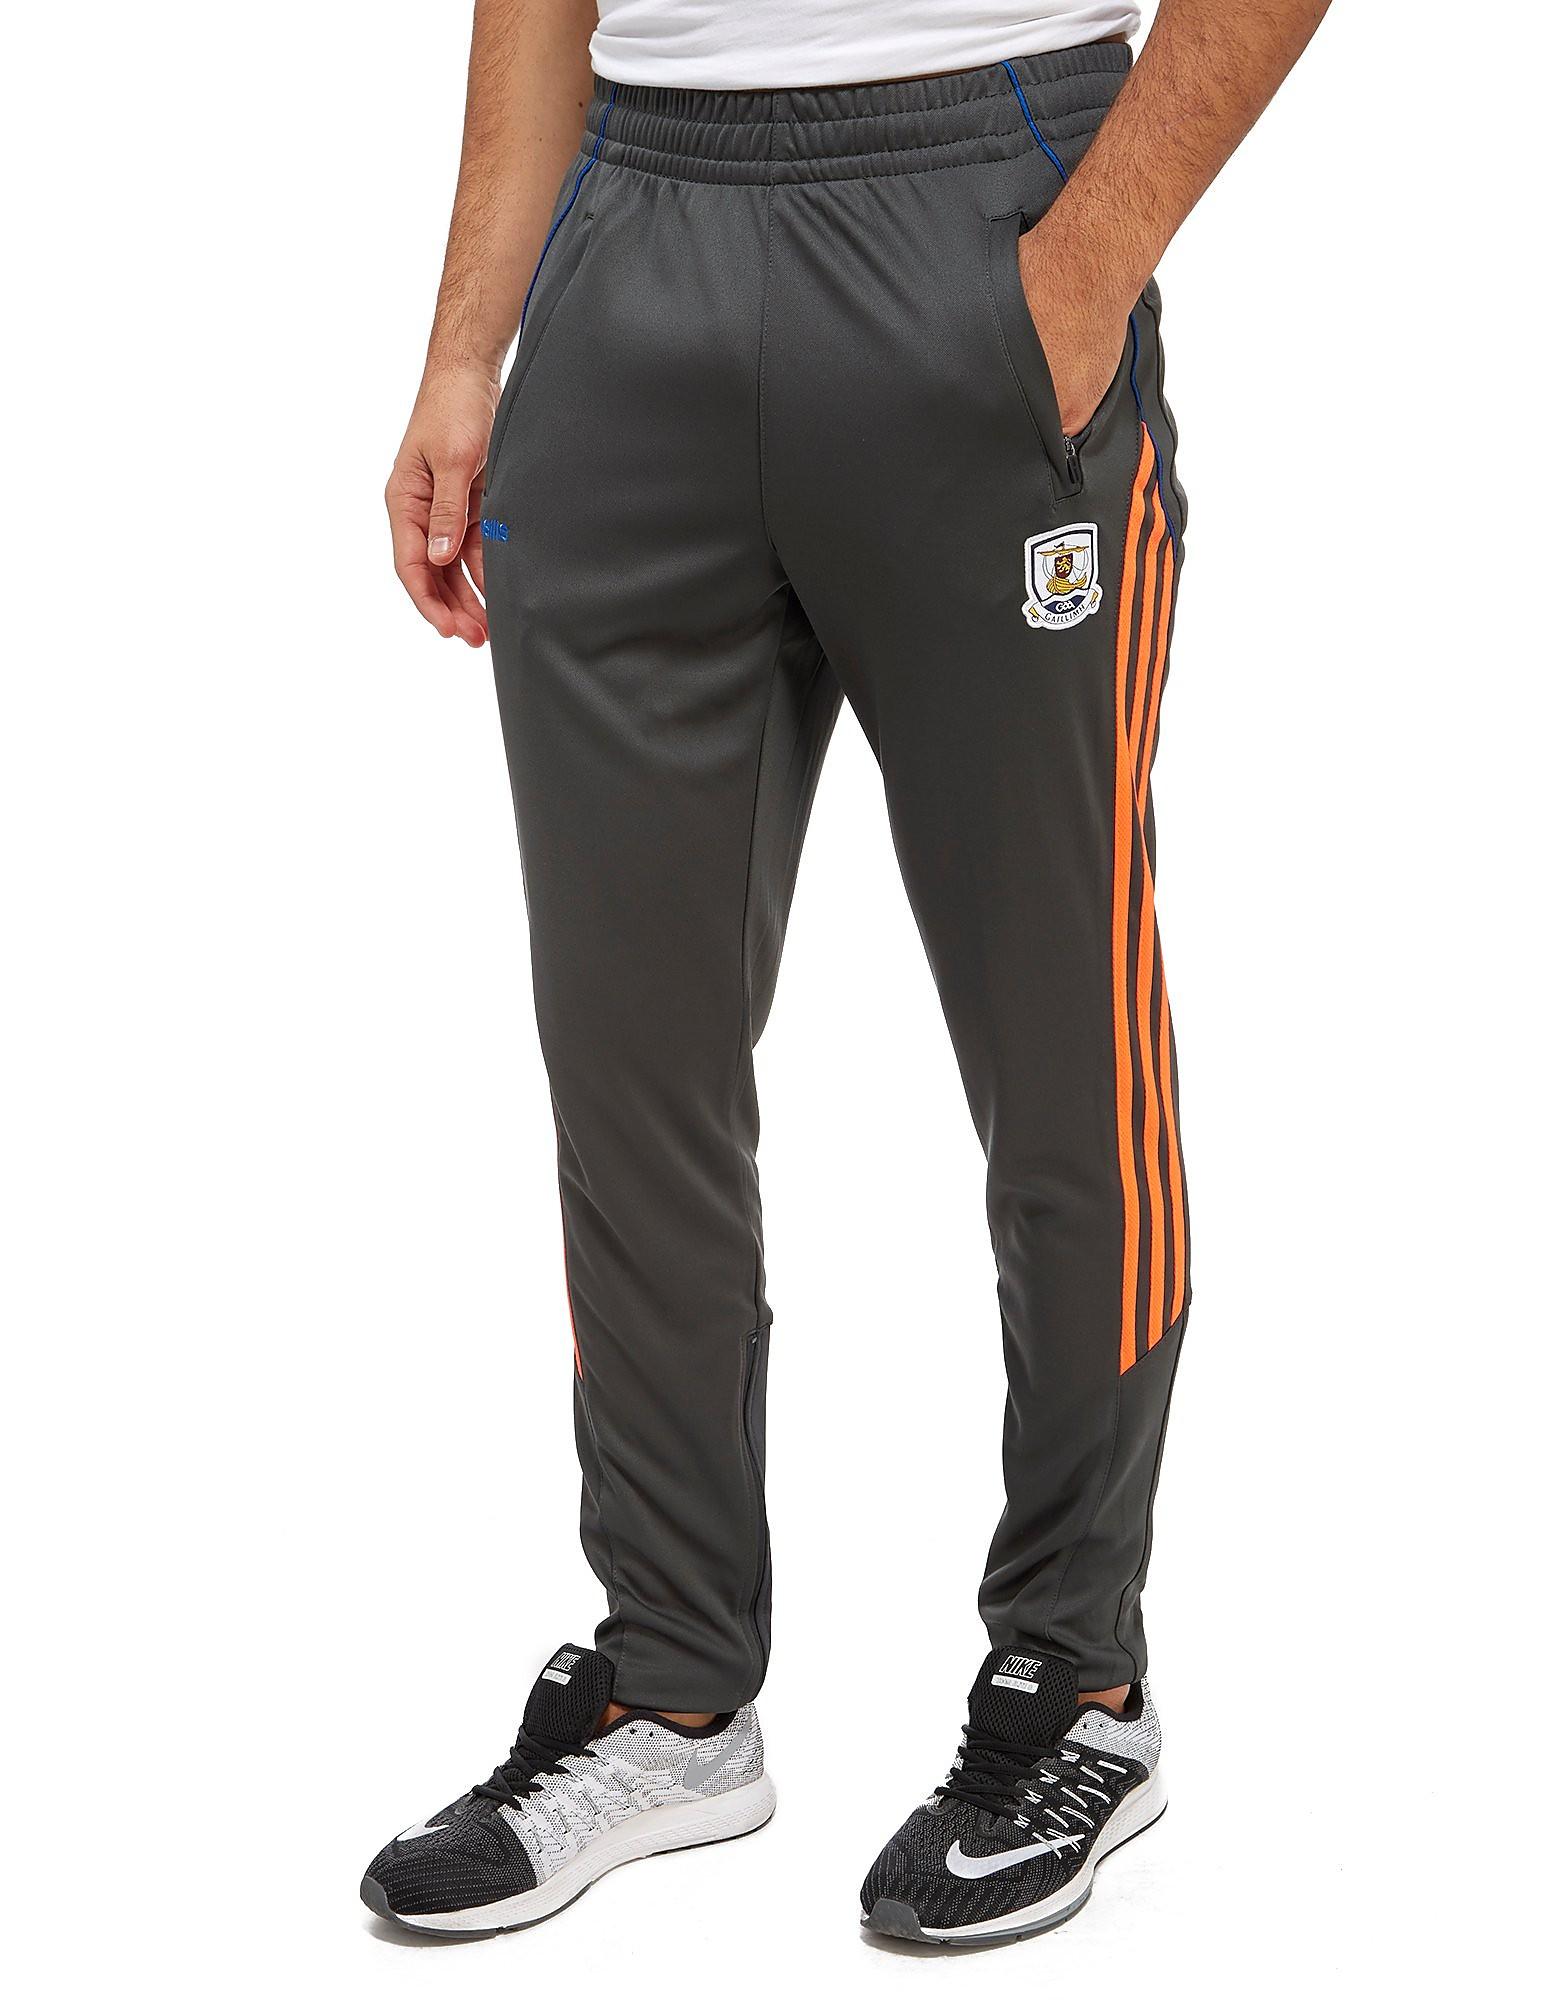 O'Neills Galway Training Pants